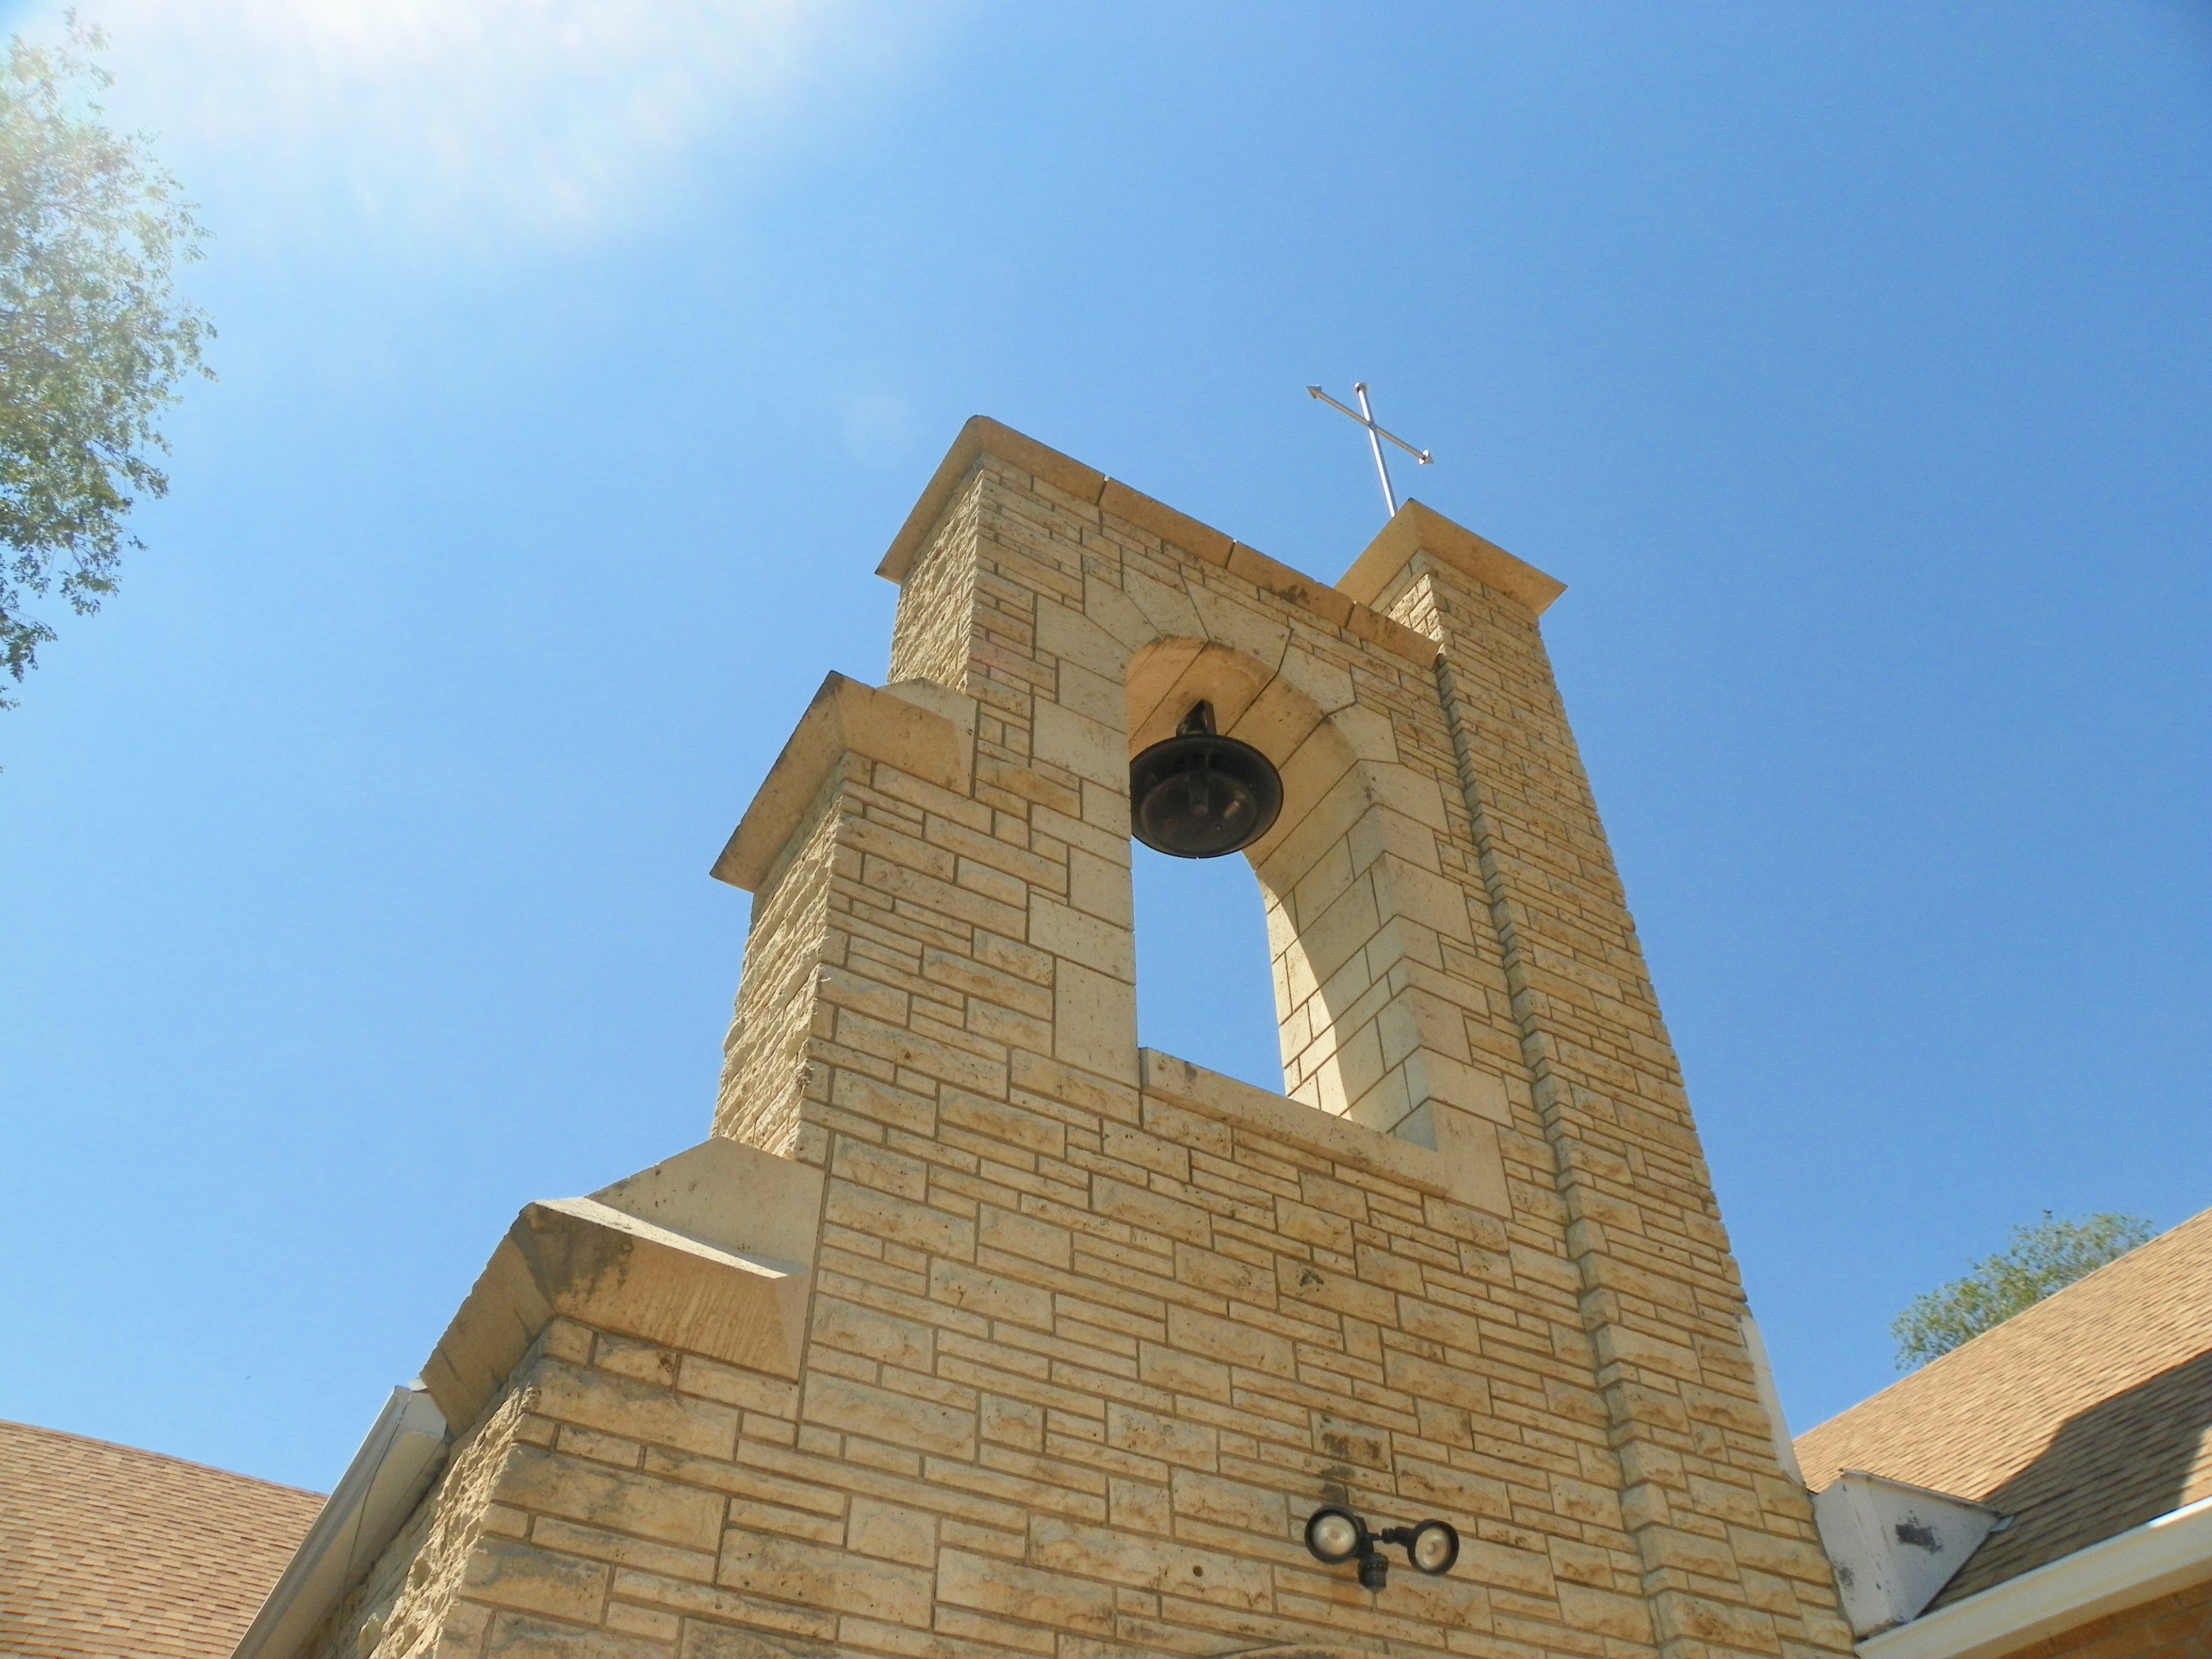 churchsteeple.jpg